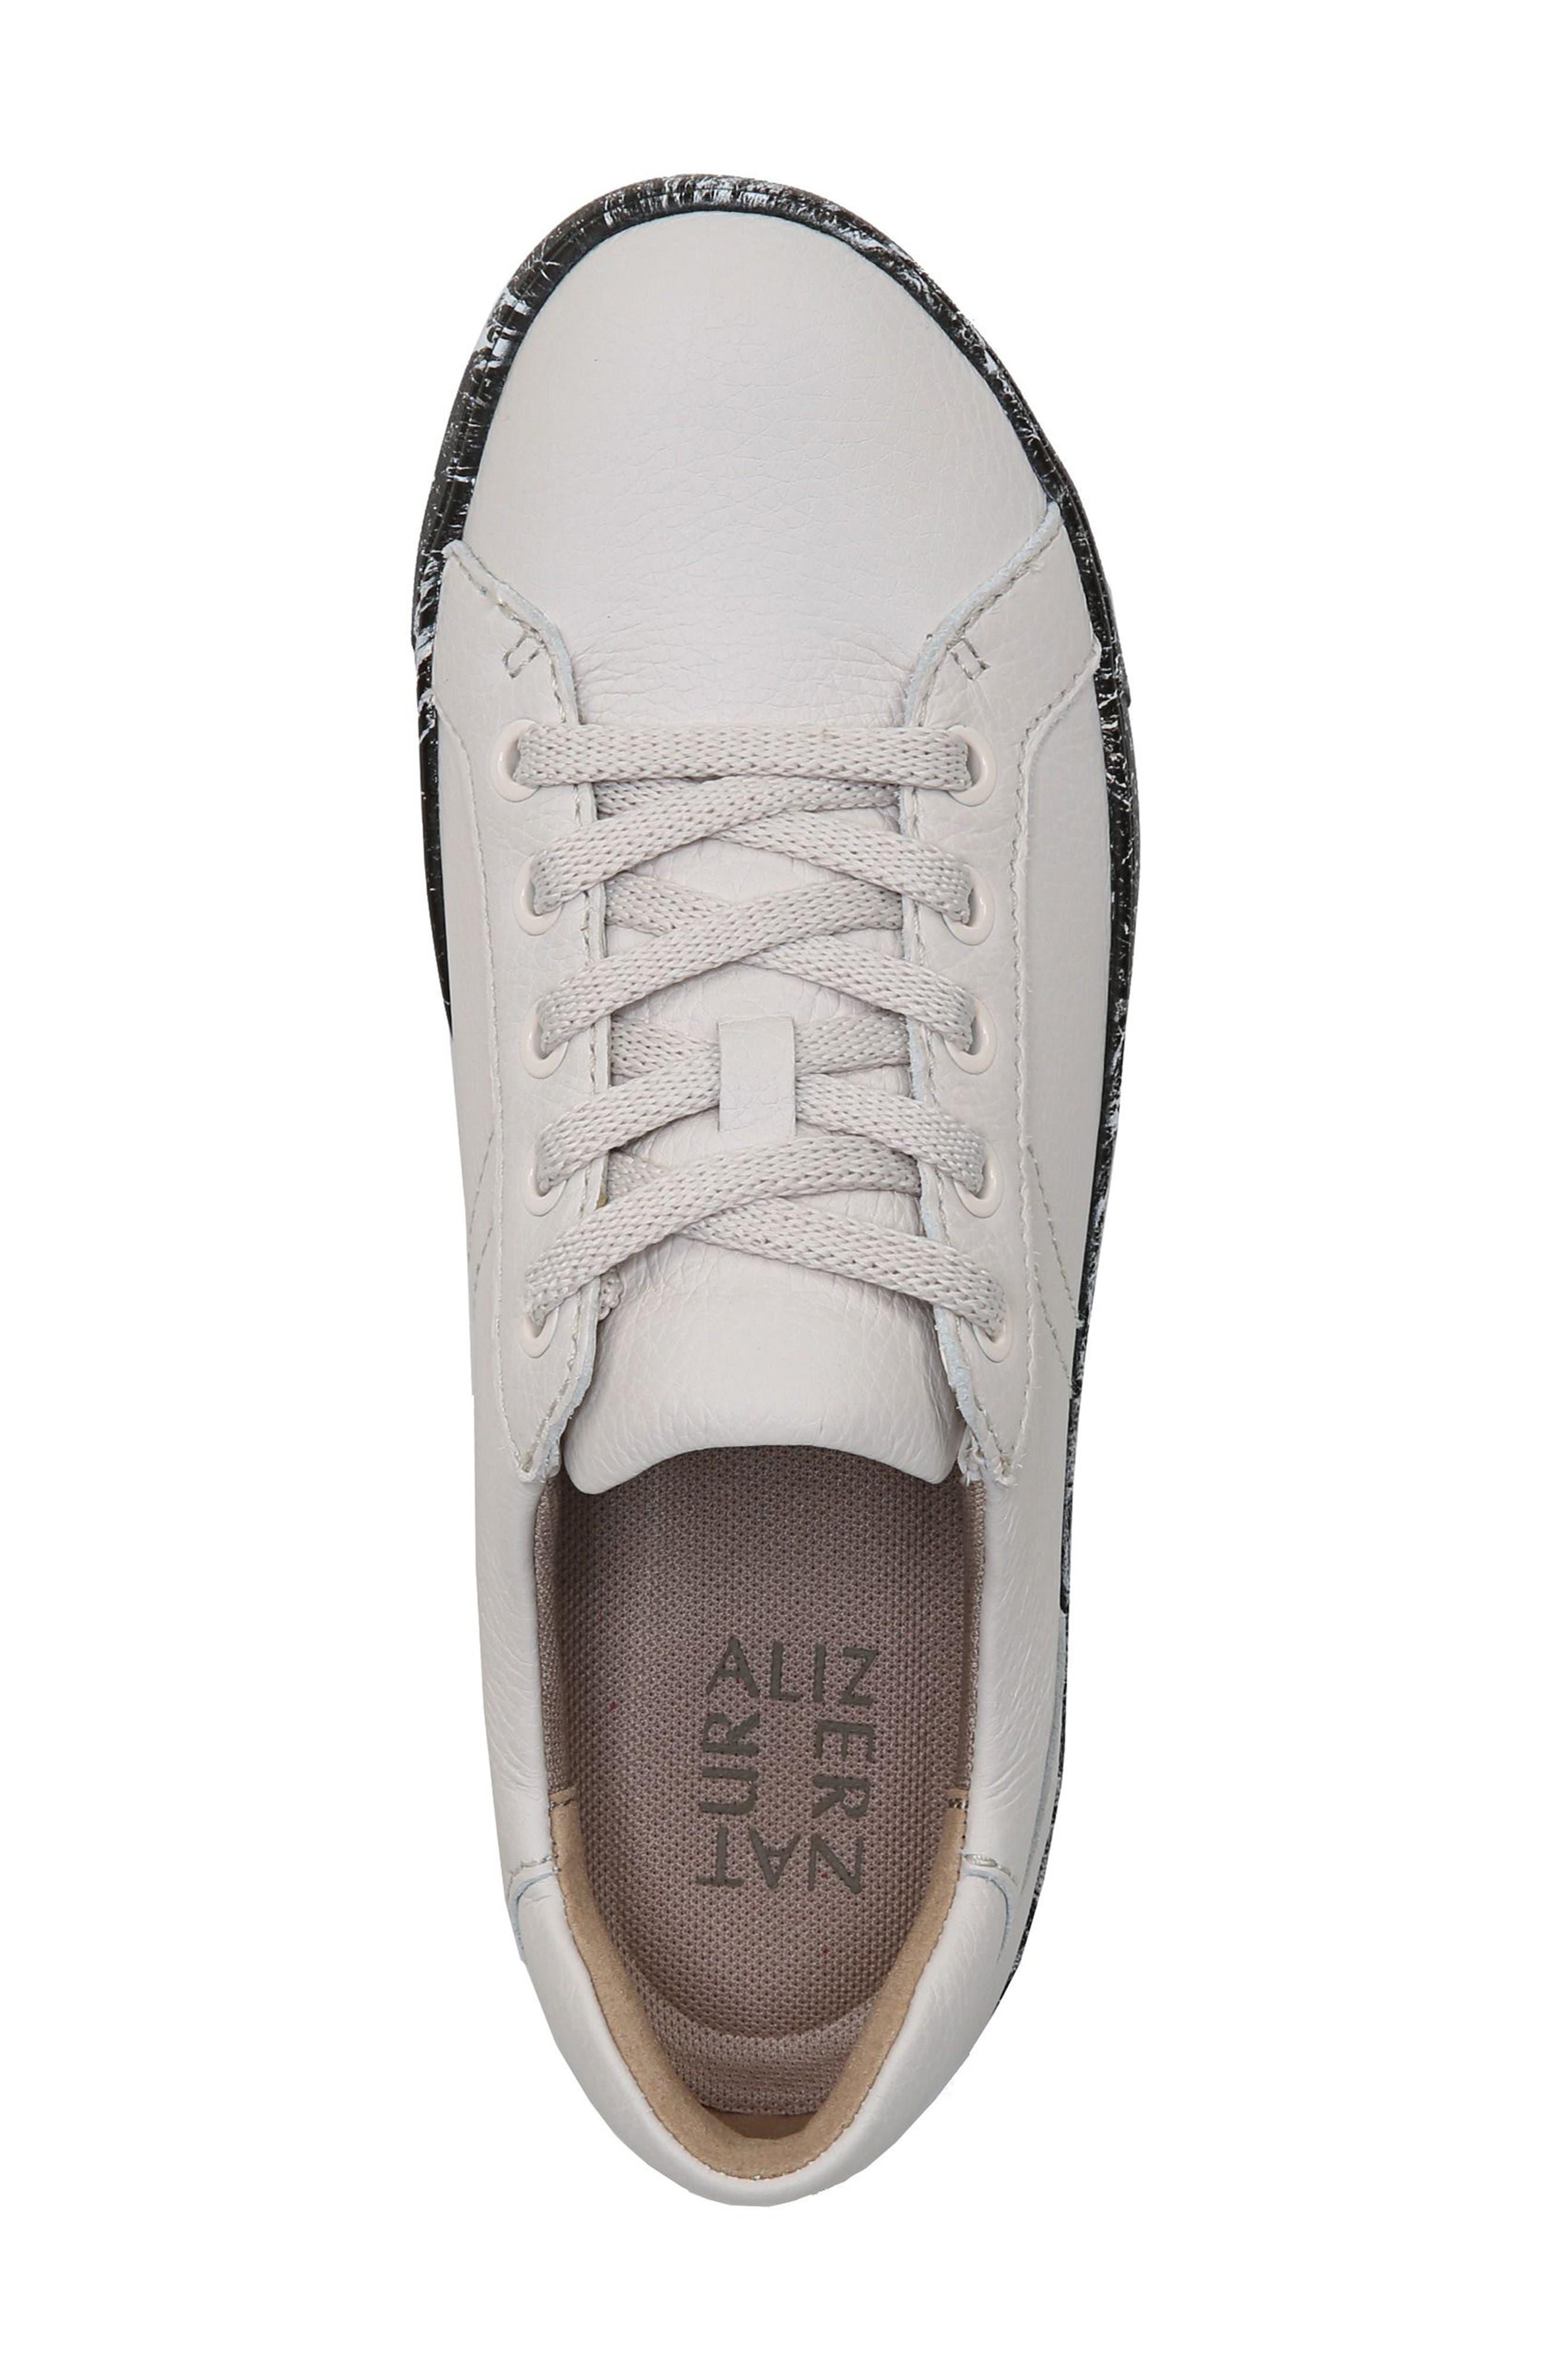 Morrison Sneaker,                             Alternate thumbnail 6, color,                             Beige Pebble Leather